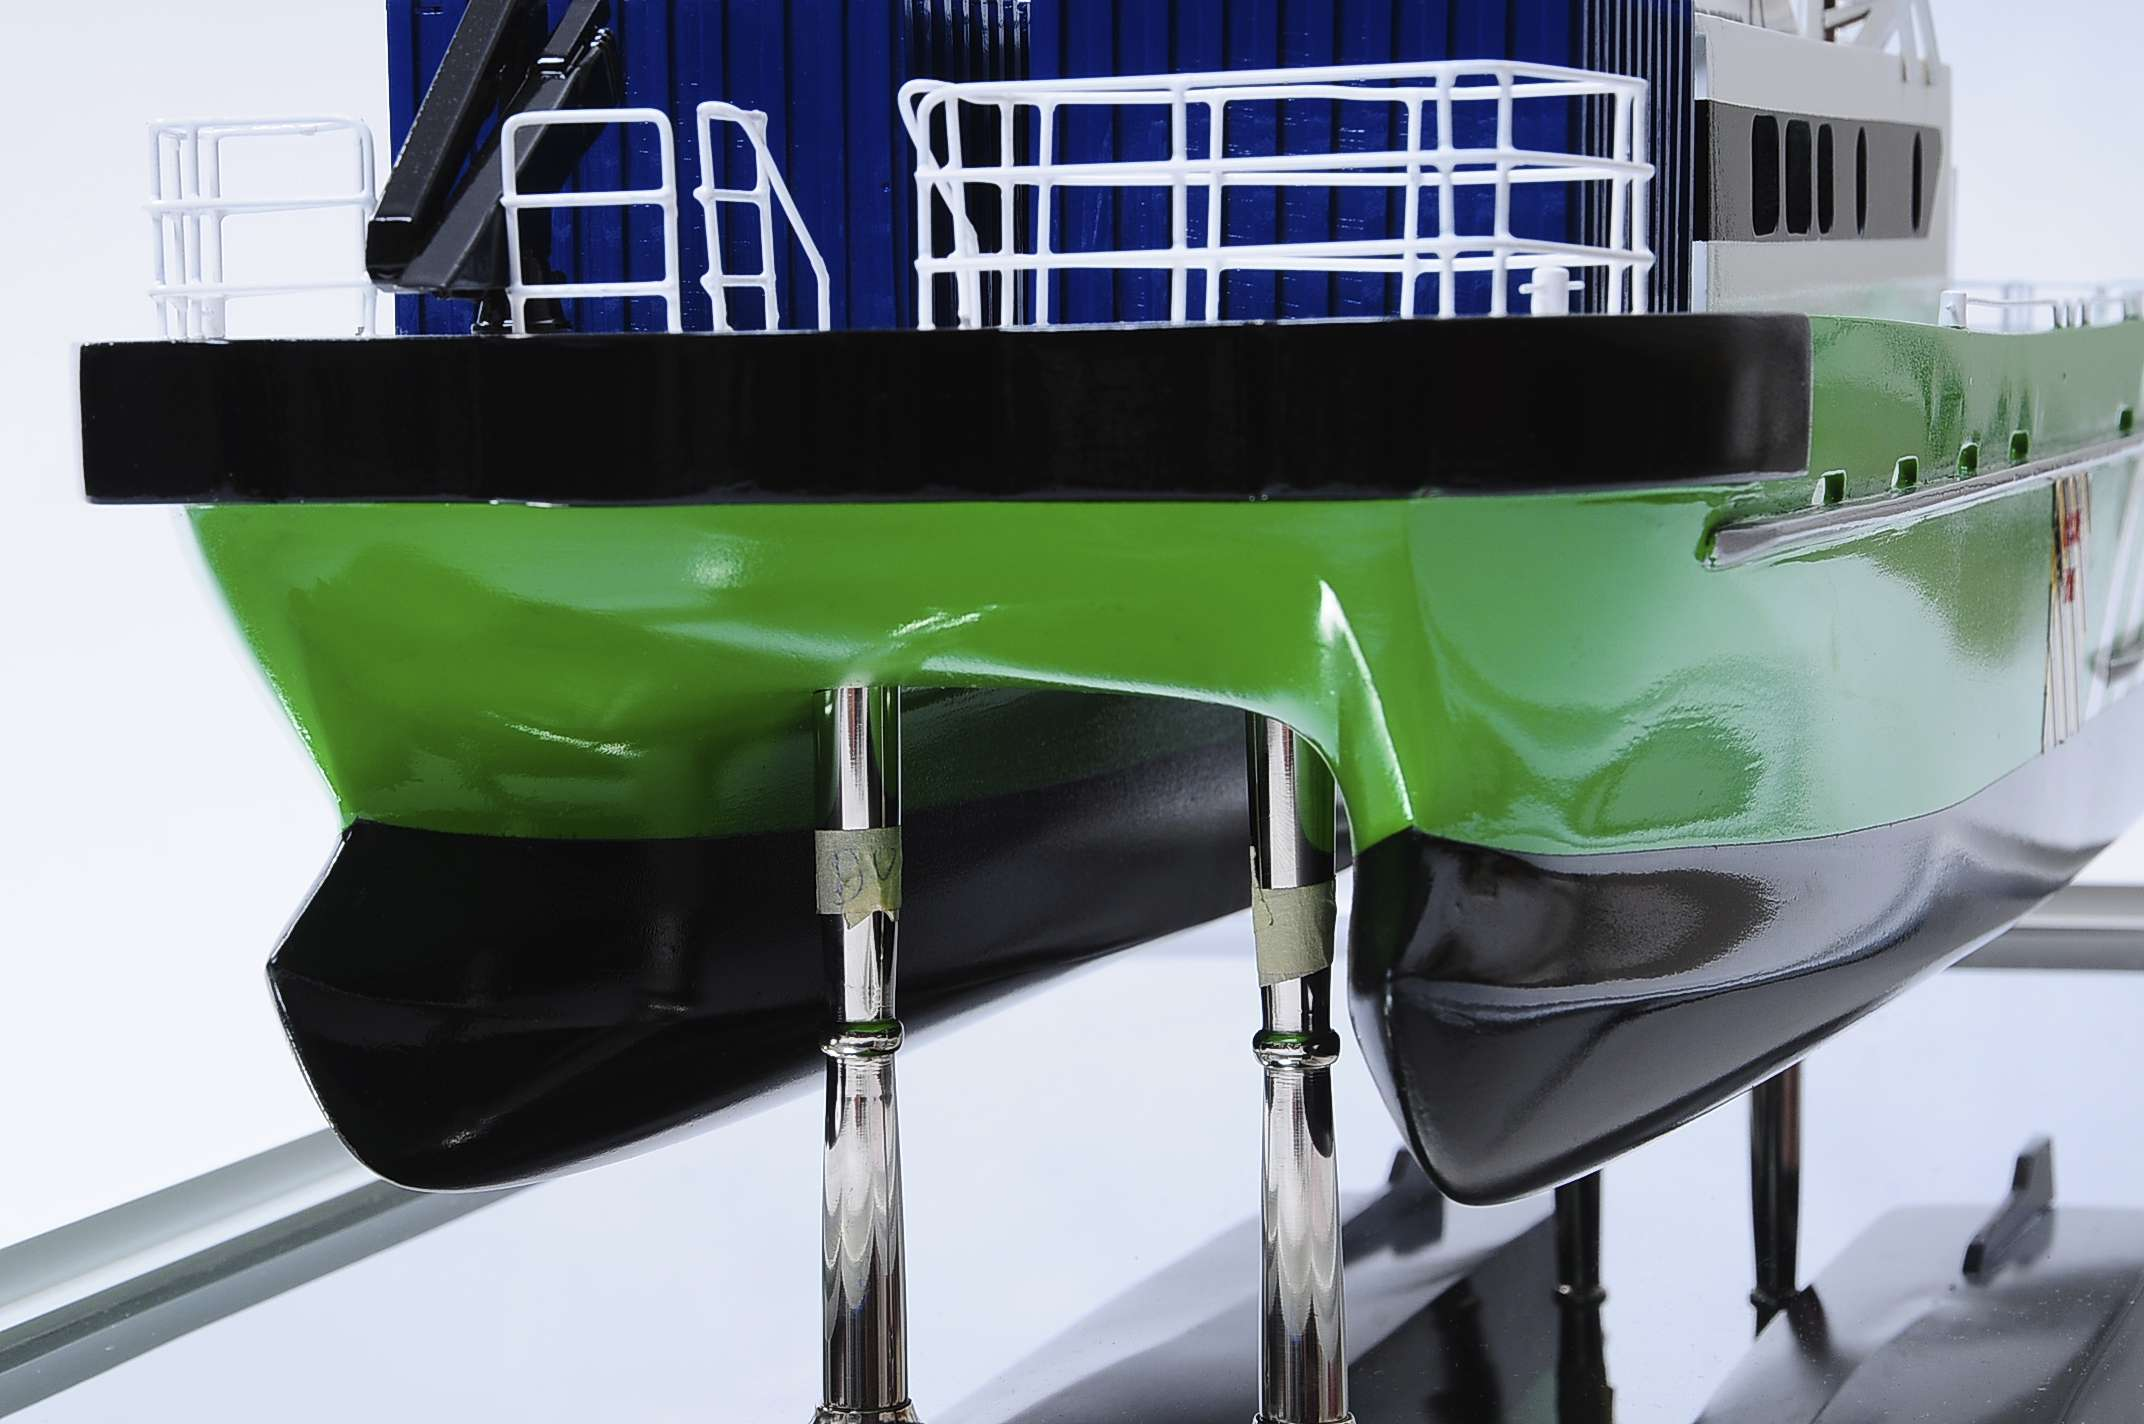 1440-4969-Wind-Express-27-Catamaran-Model